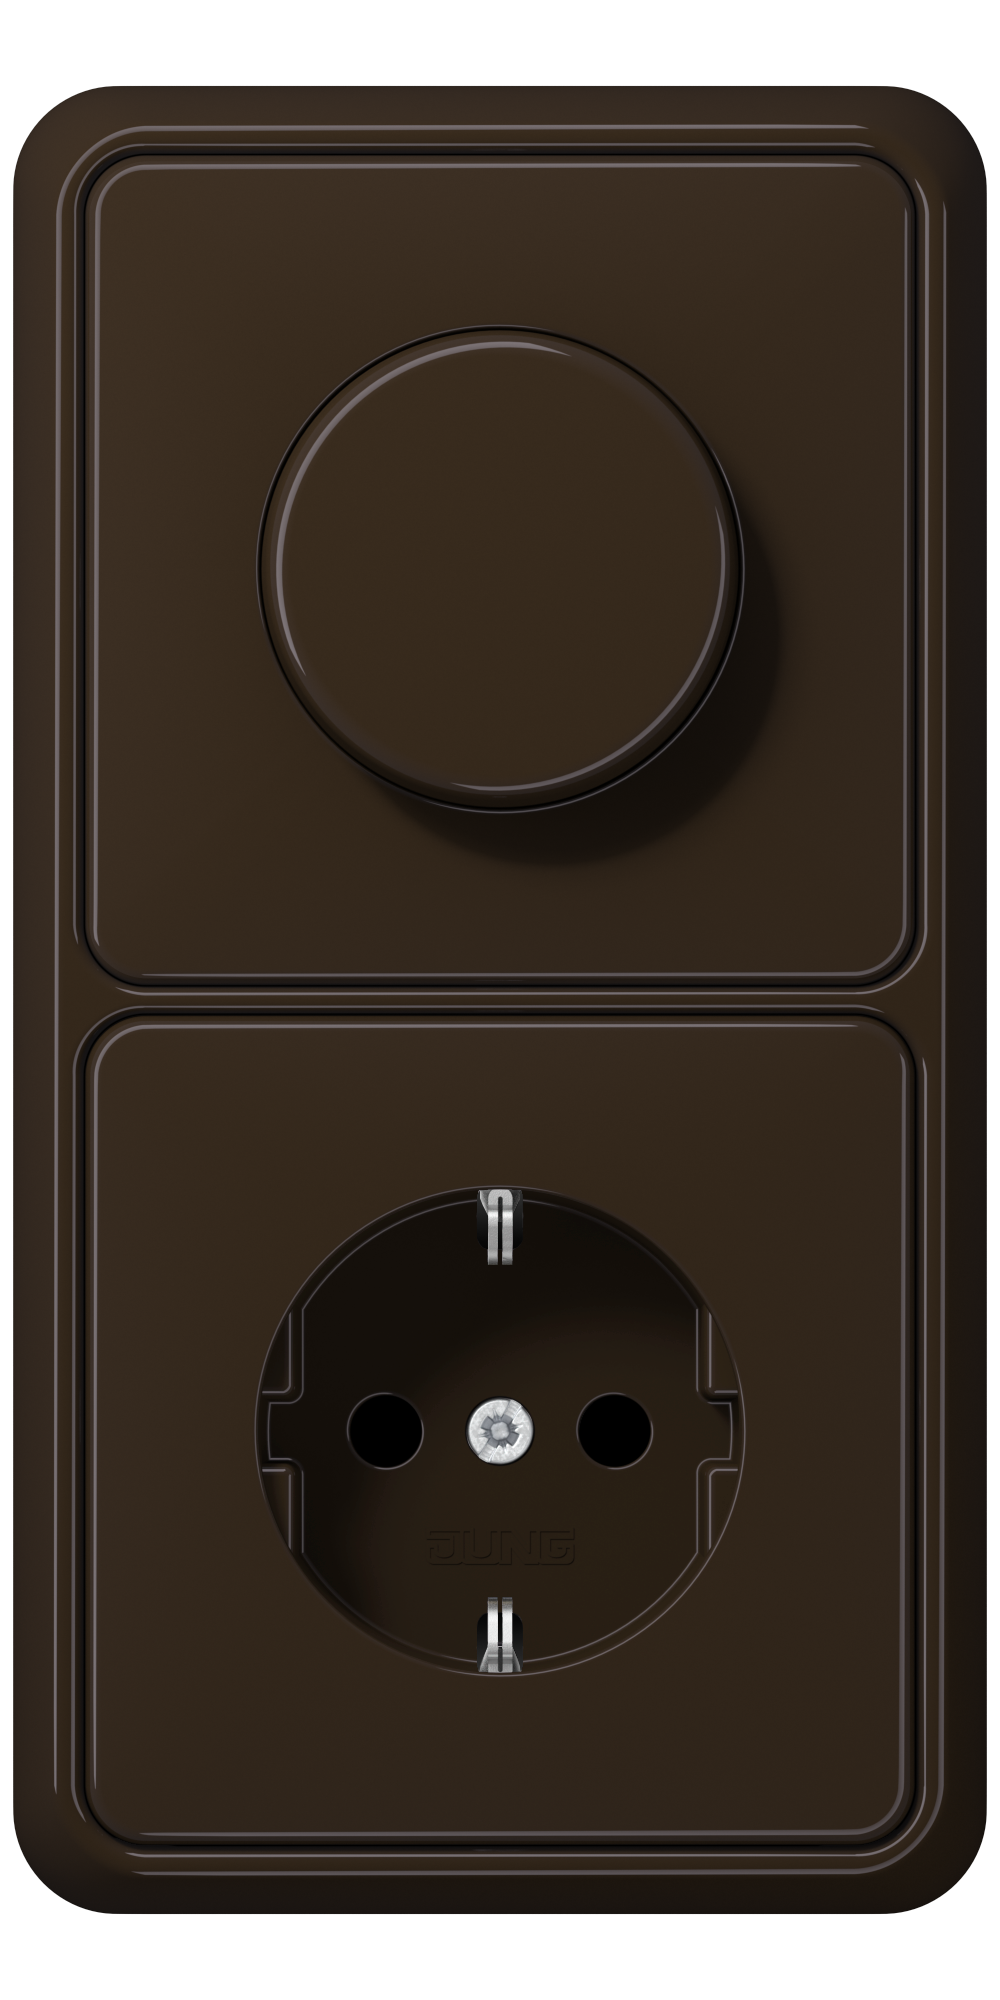 JUNG_CD500_brown_dimmer-socket